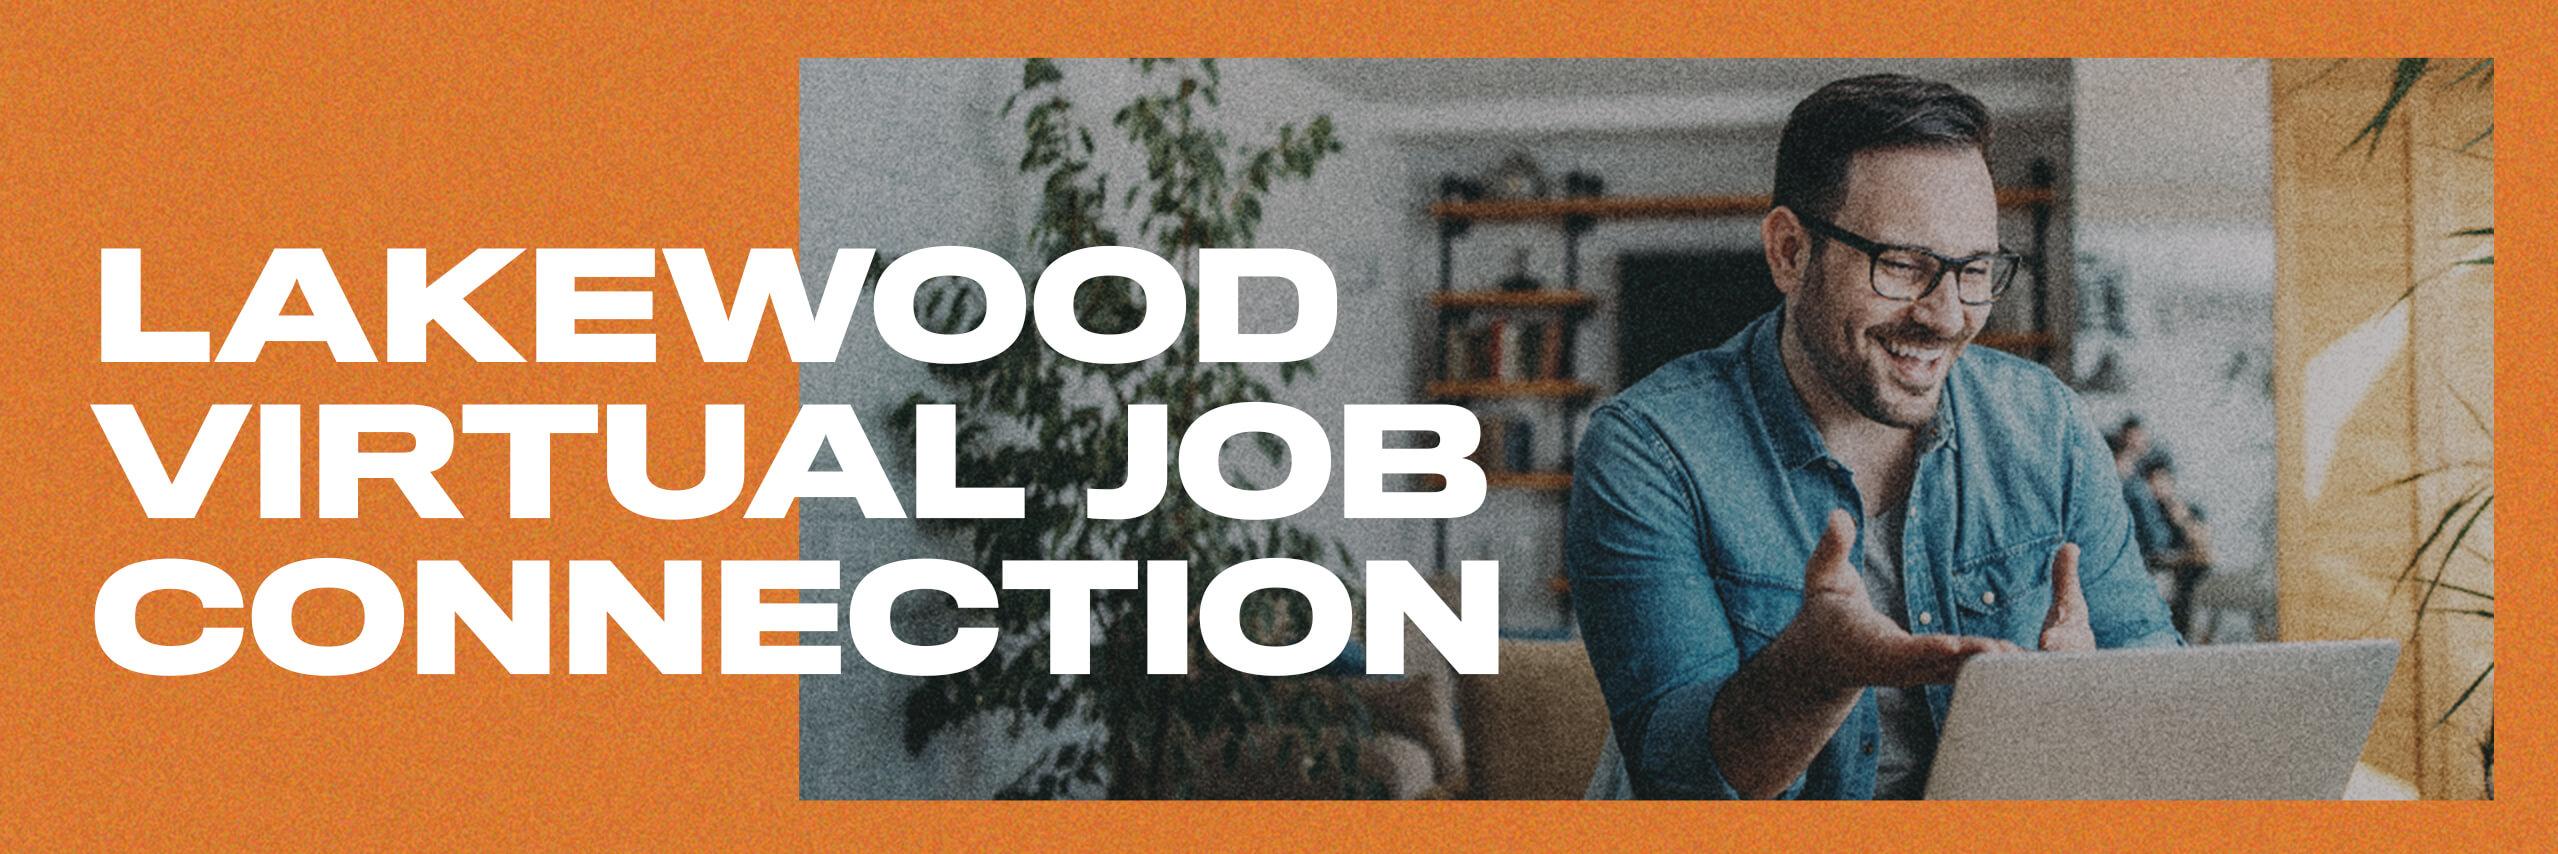 Lakewood Virtual Job Connection